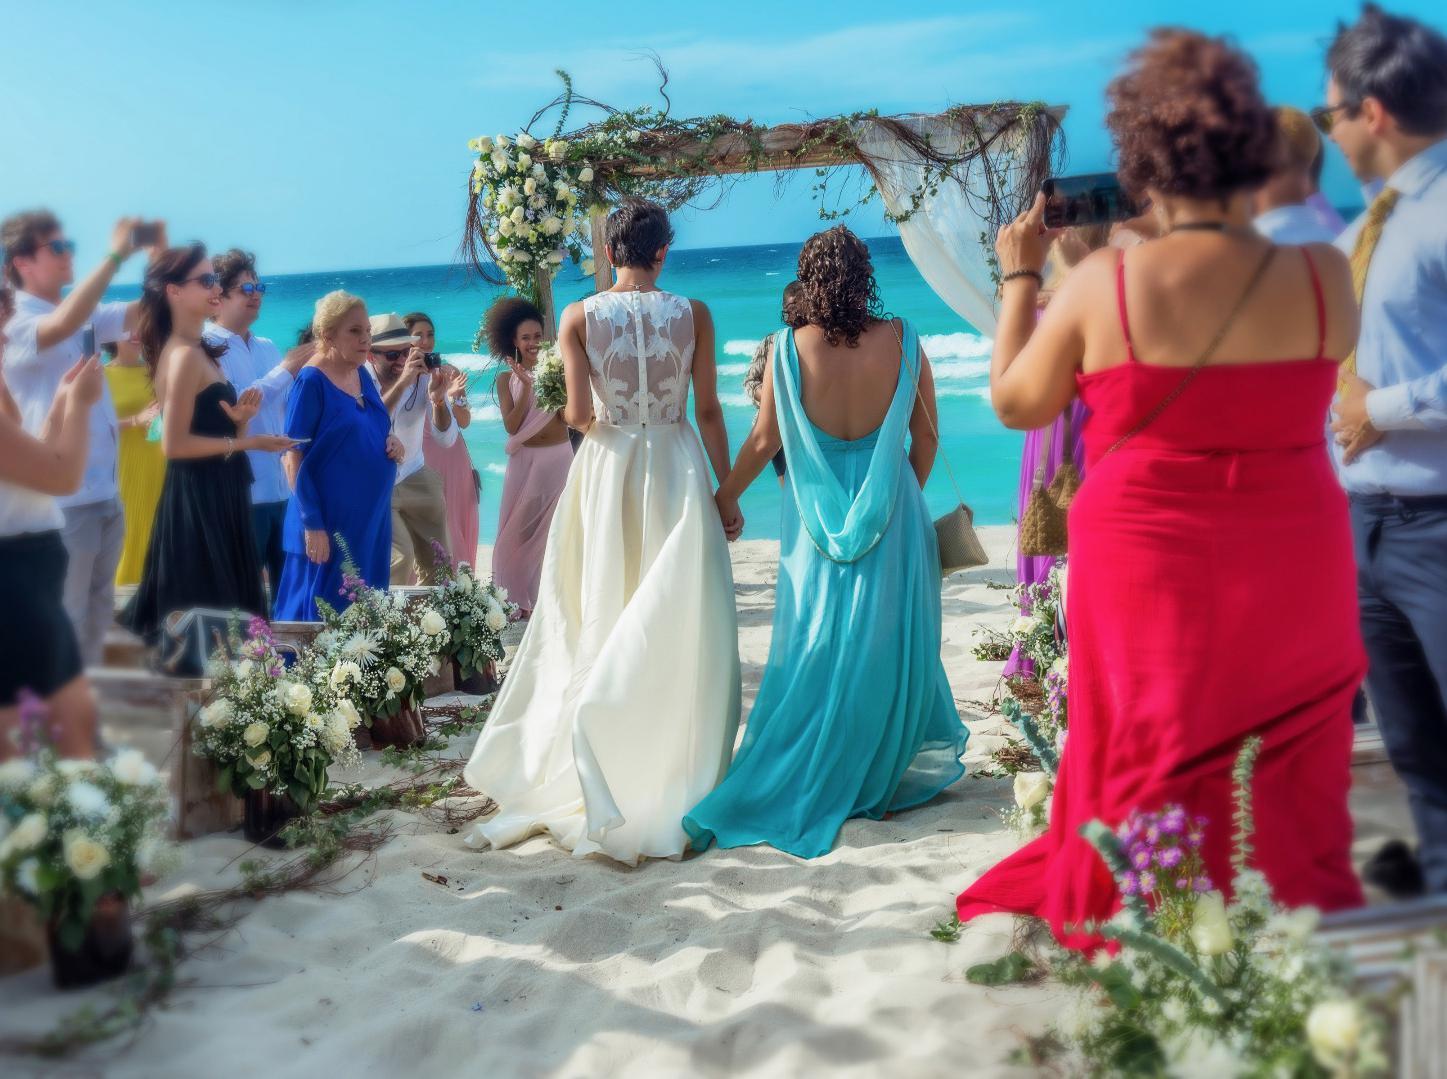 bodas-sin-clasificar-sin-tema-cuba-34562.jpg